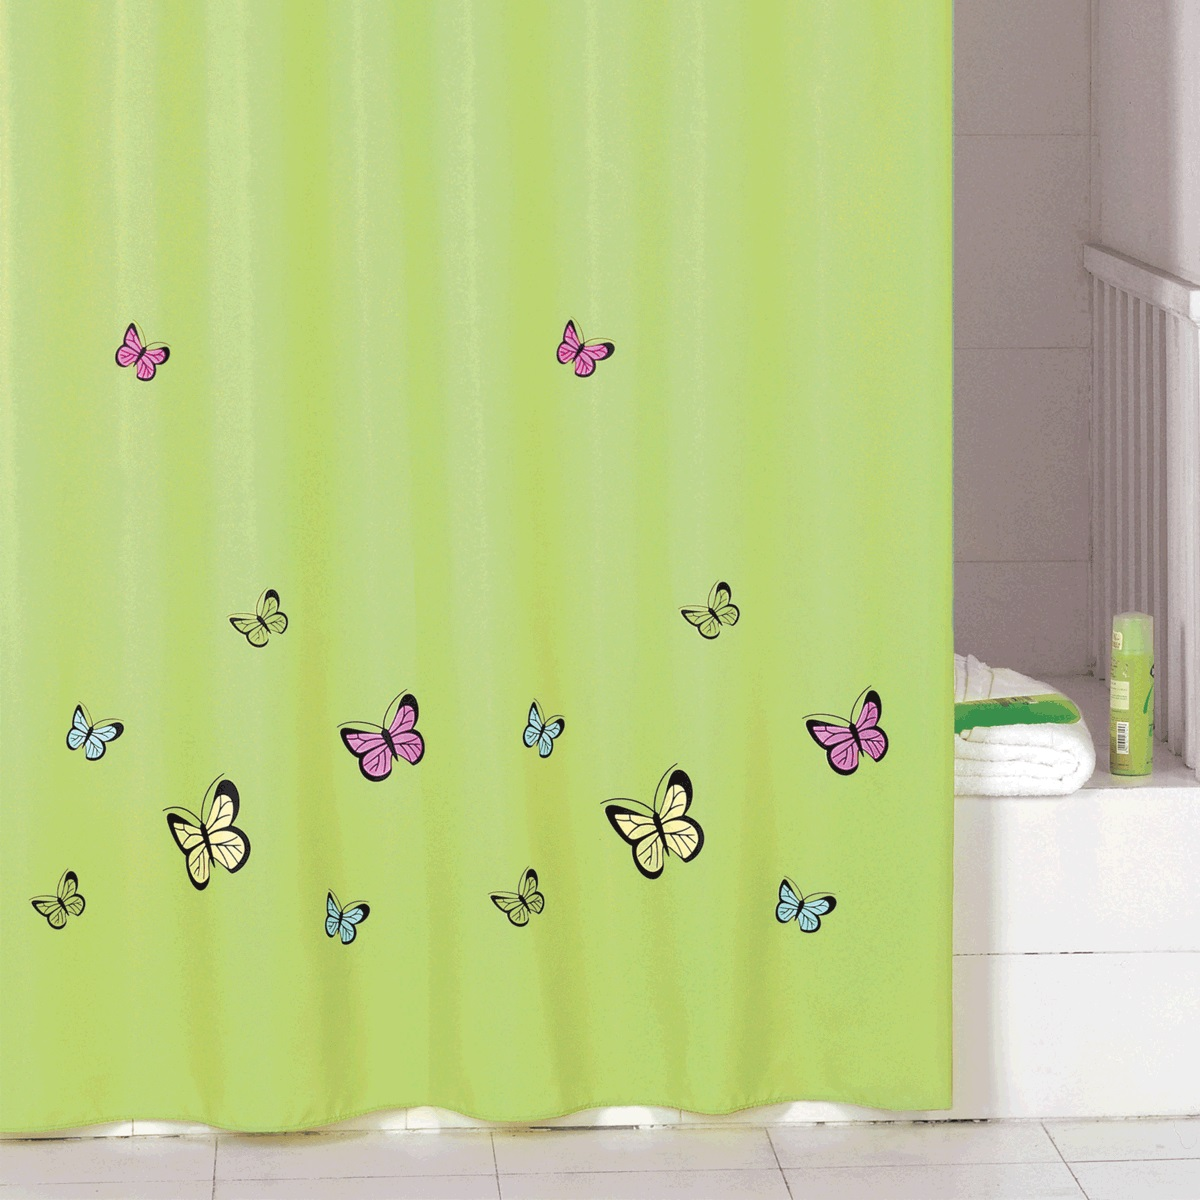 Штора для ванной Iddis Green Butterfly, цвет: зеленый, 200 x 200 см шторы для ванной iddis штора для ванной